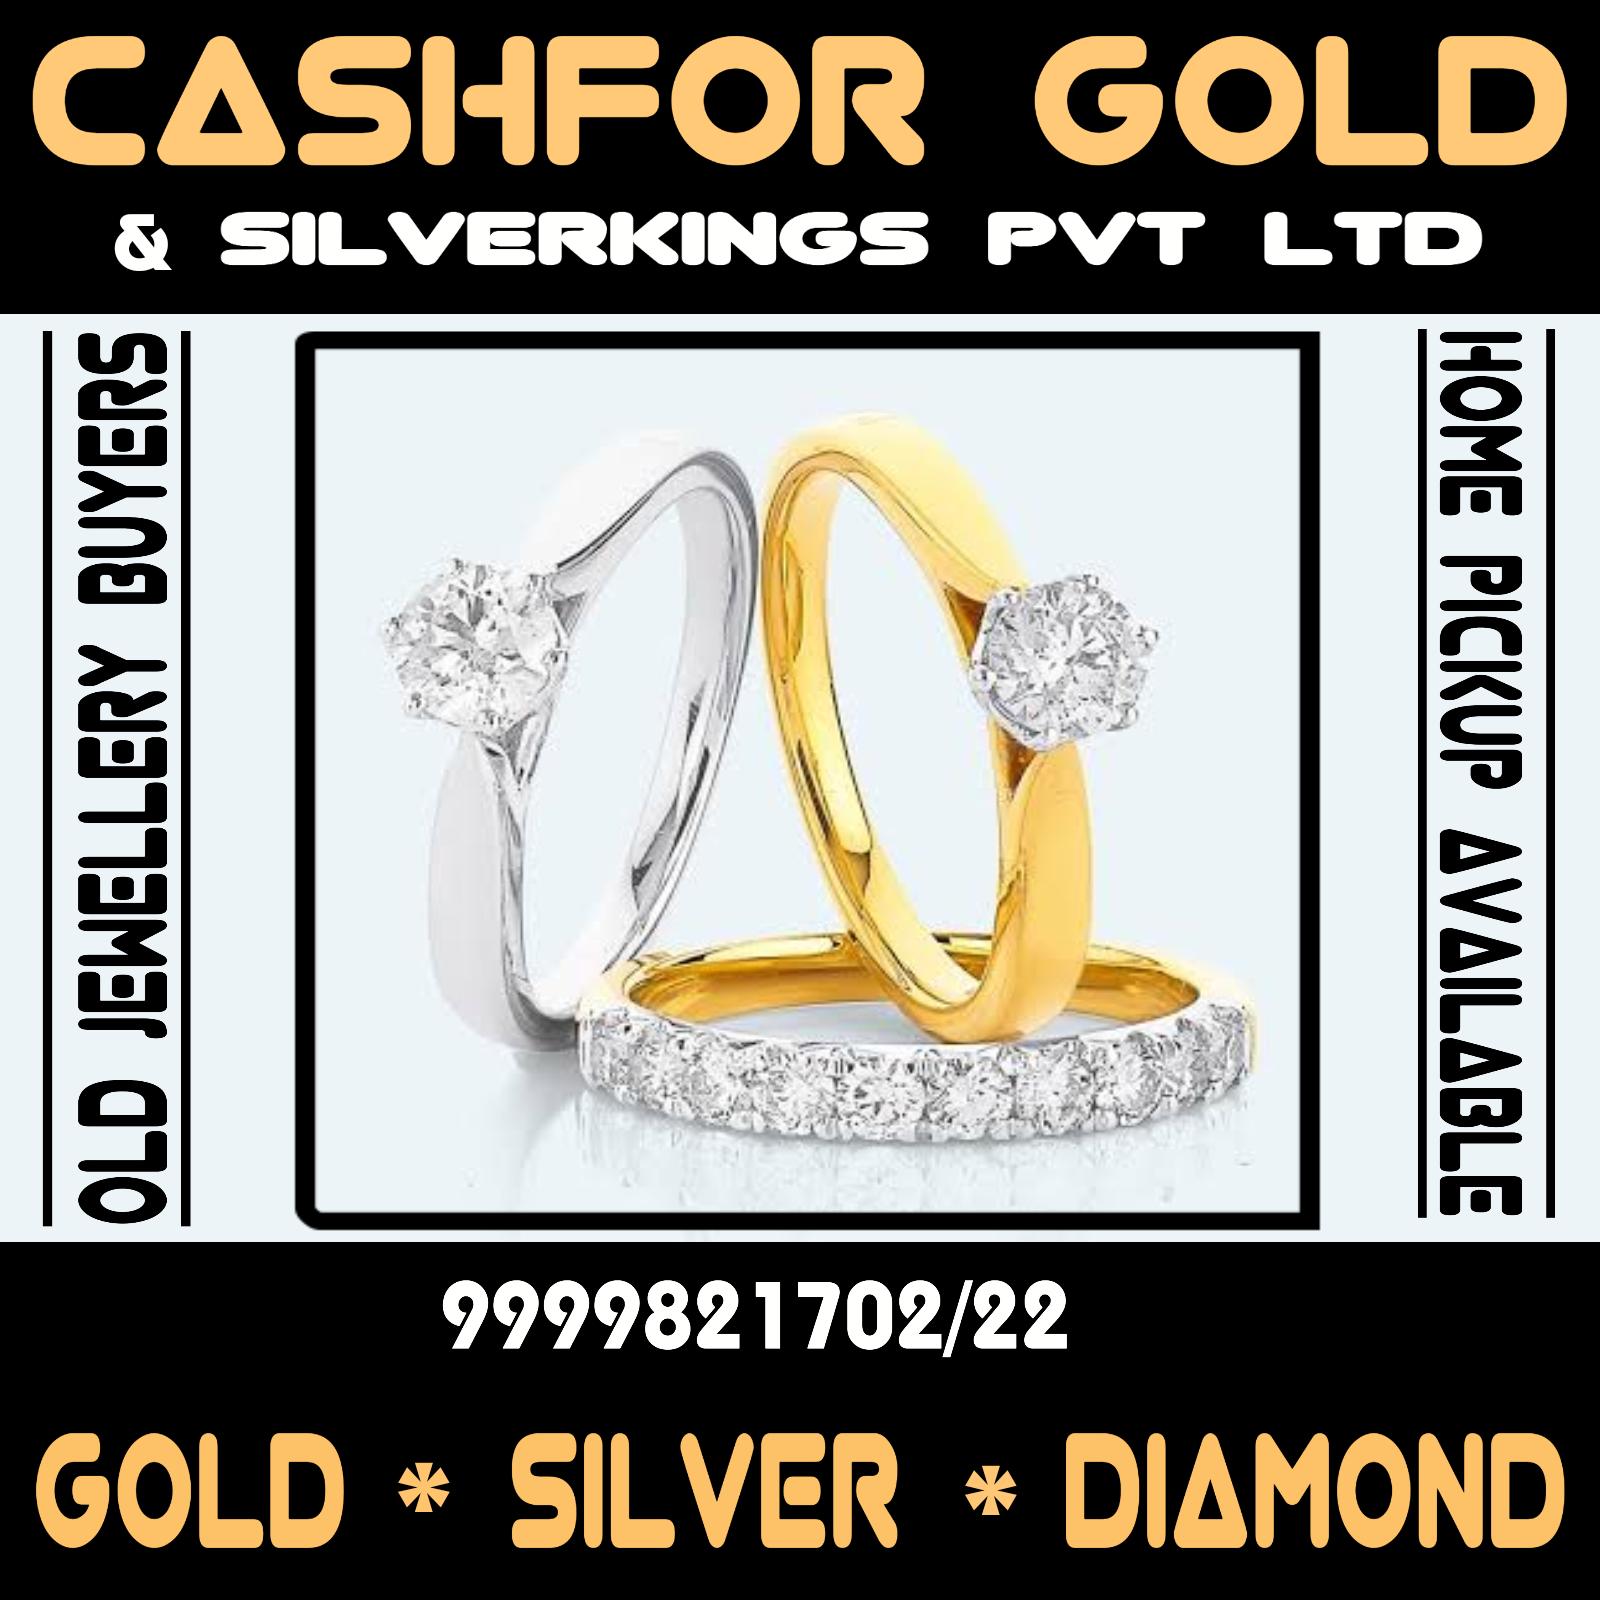 Sell scrap Silver Gems